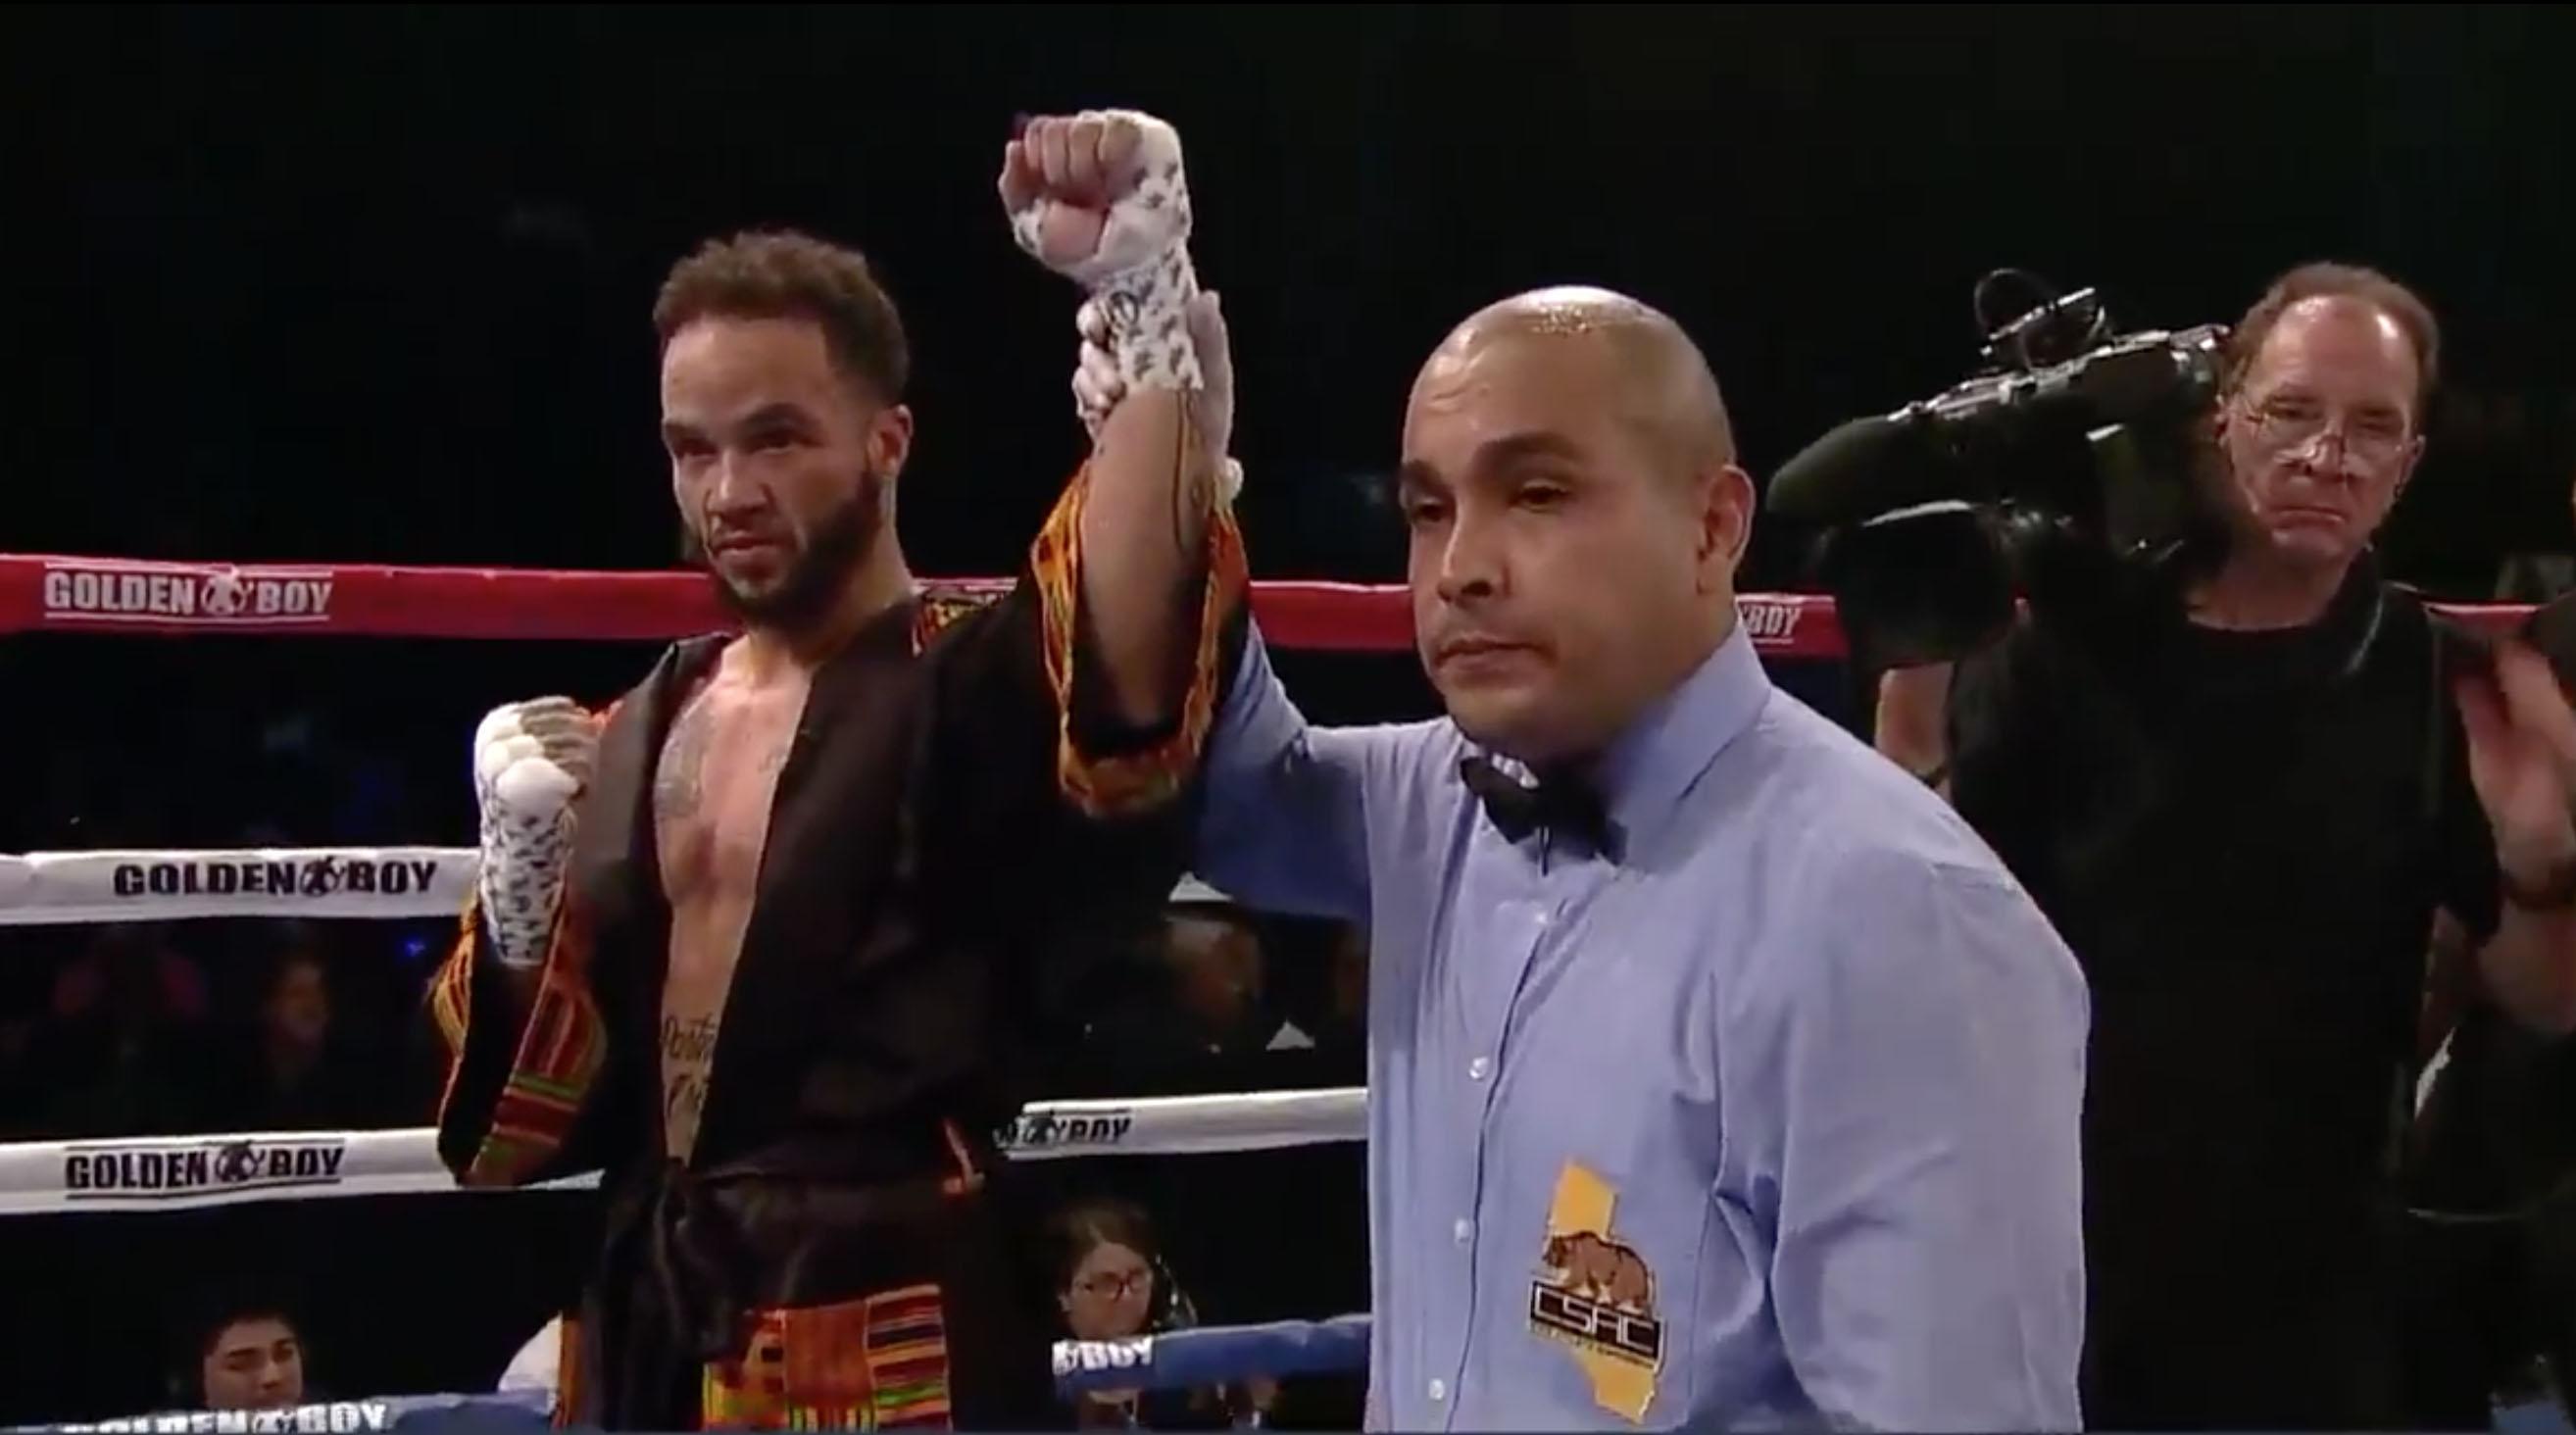 Transgender male Patricio Mauel wins boxing match